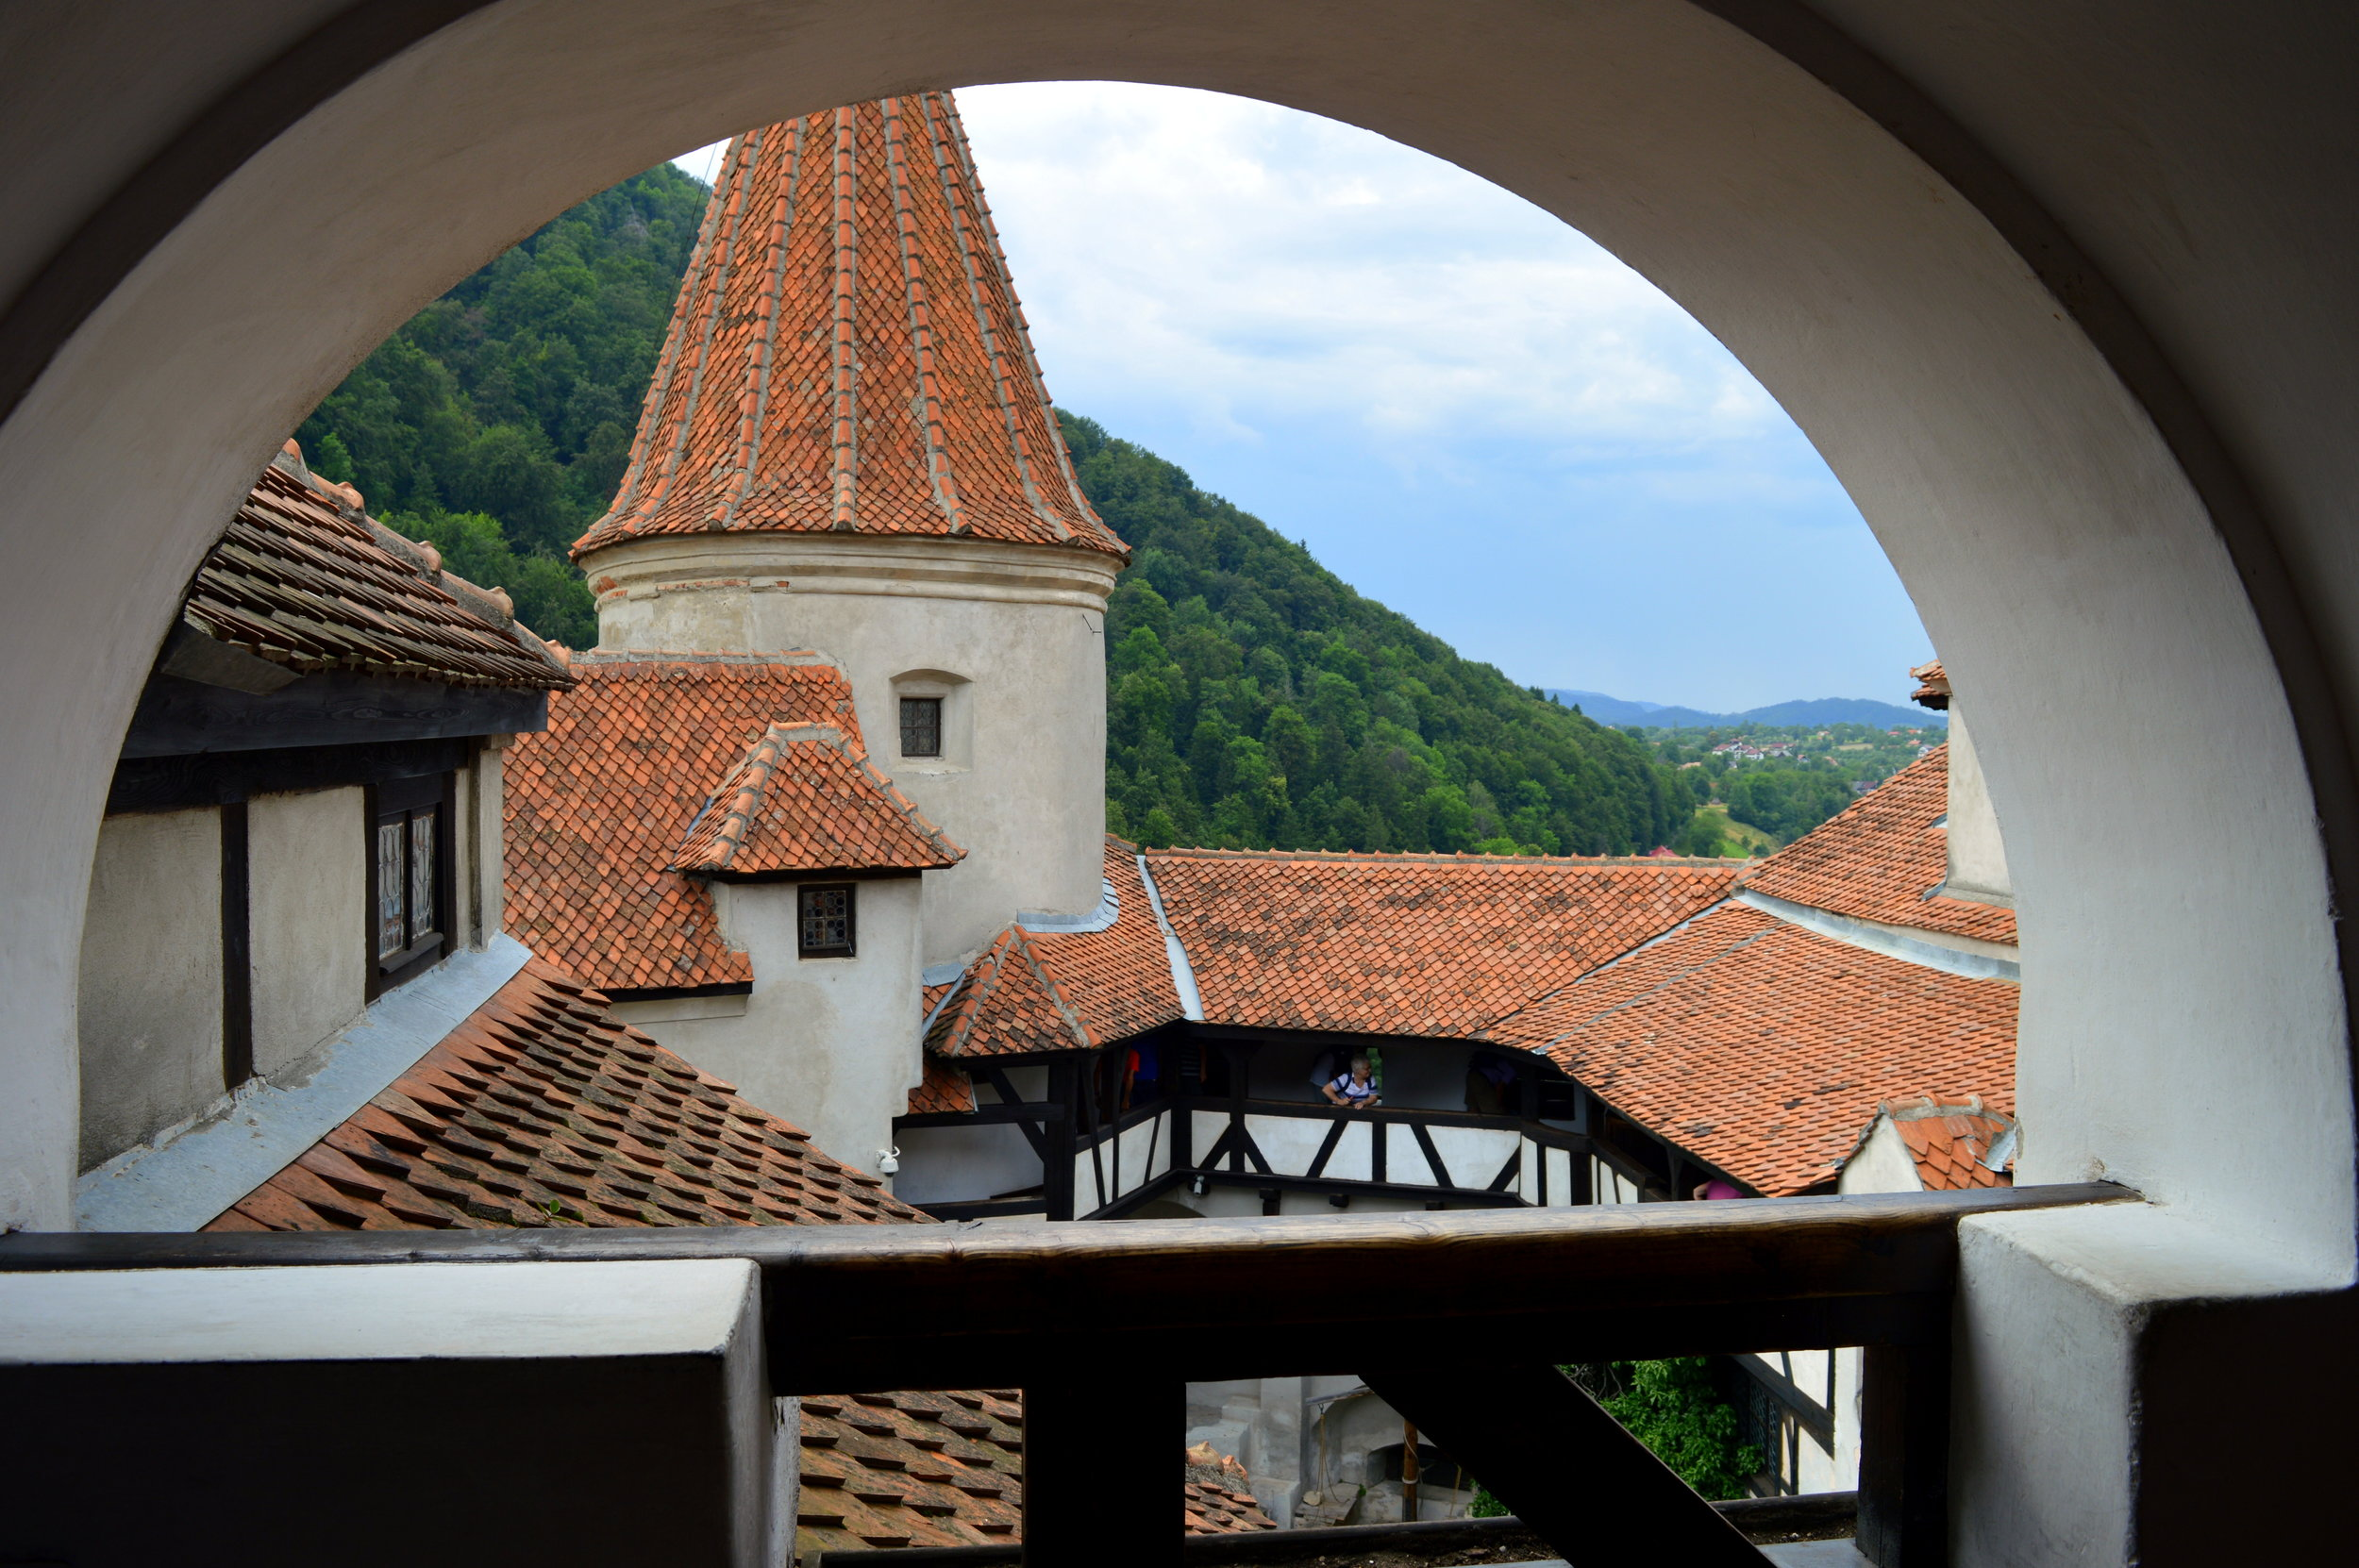 Dracula - Bran Castle, Romania